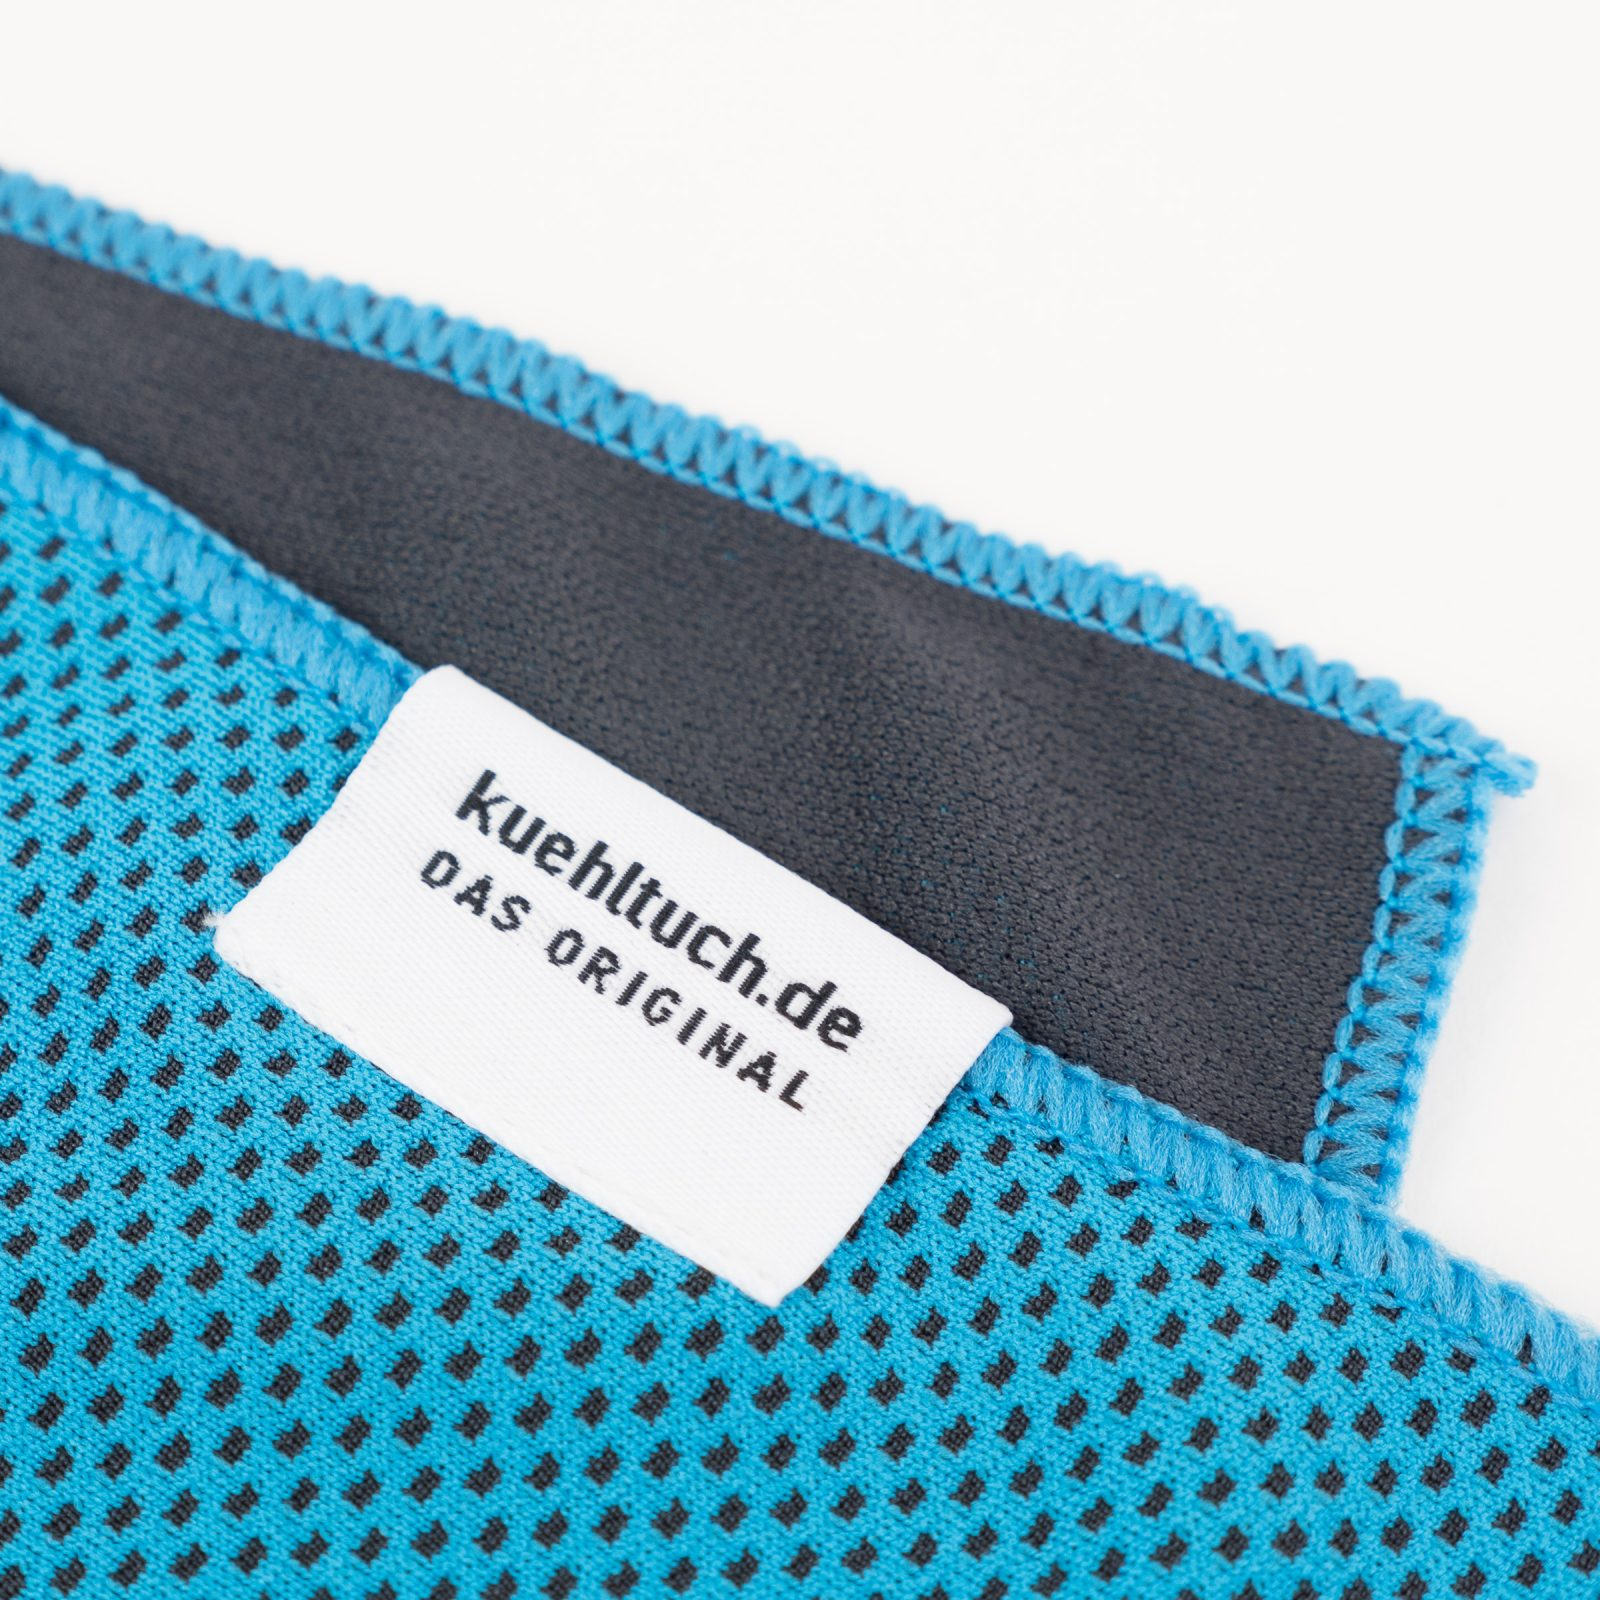 Kuehltuch himmelblau Label